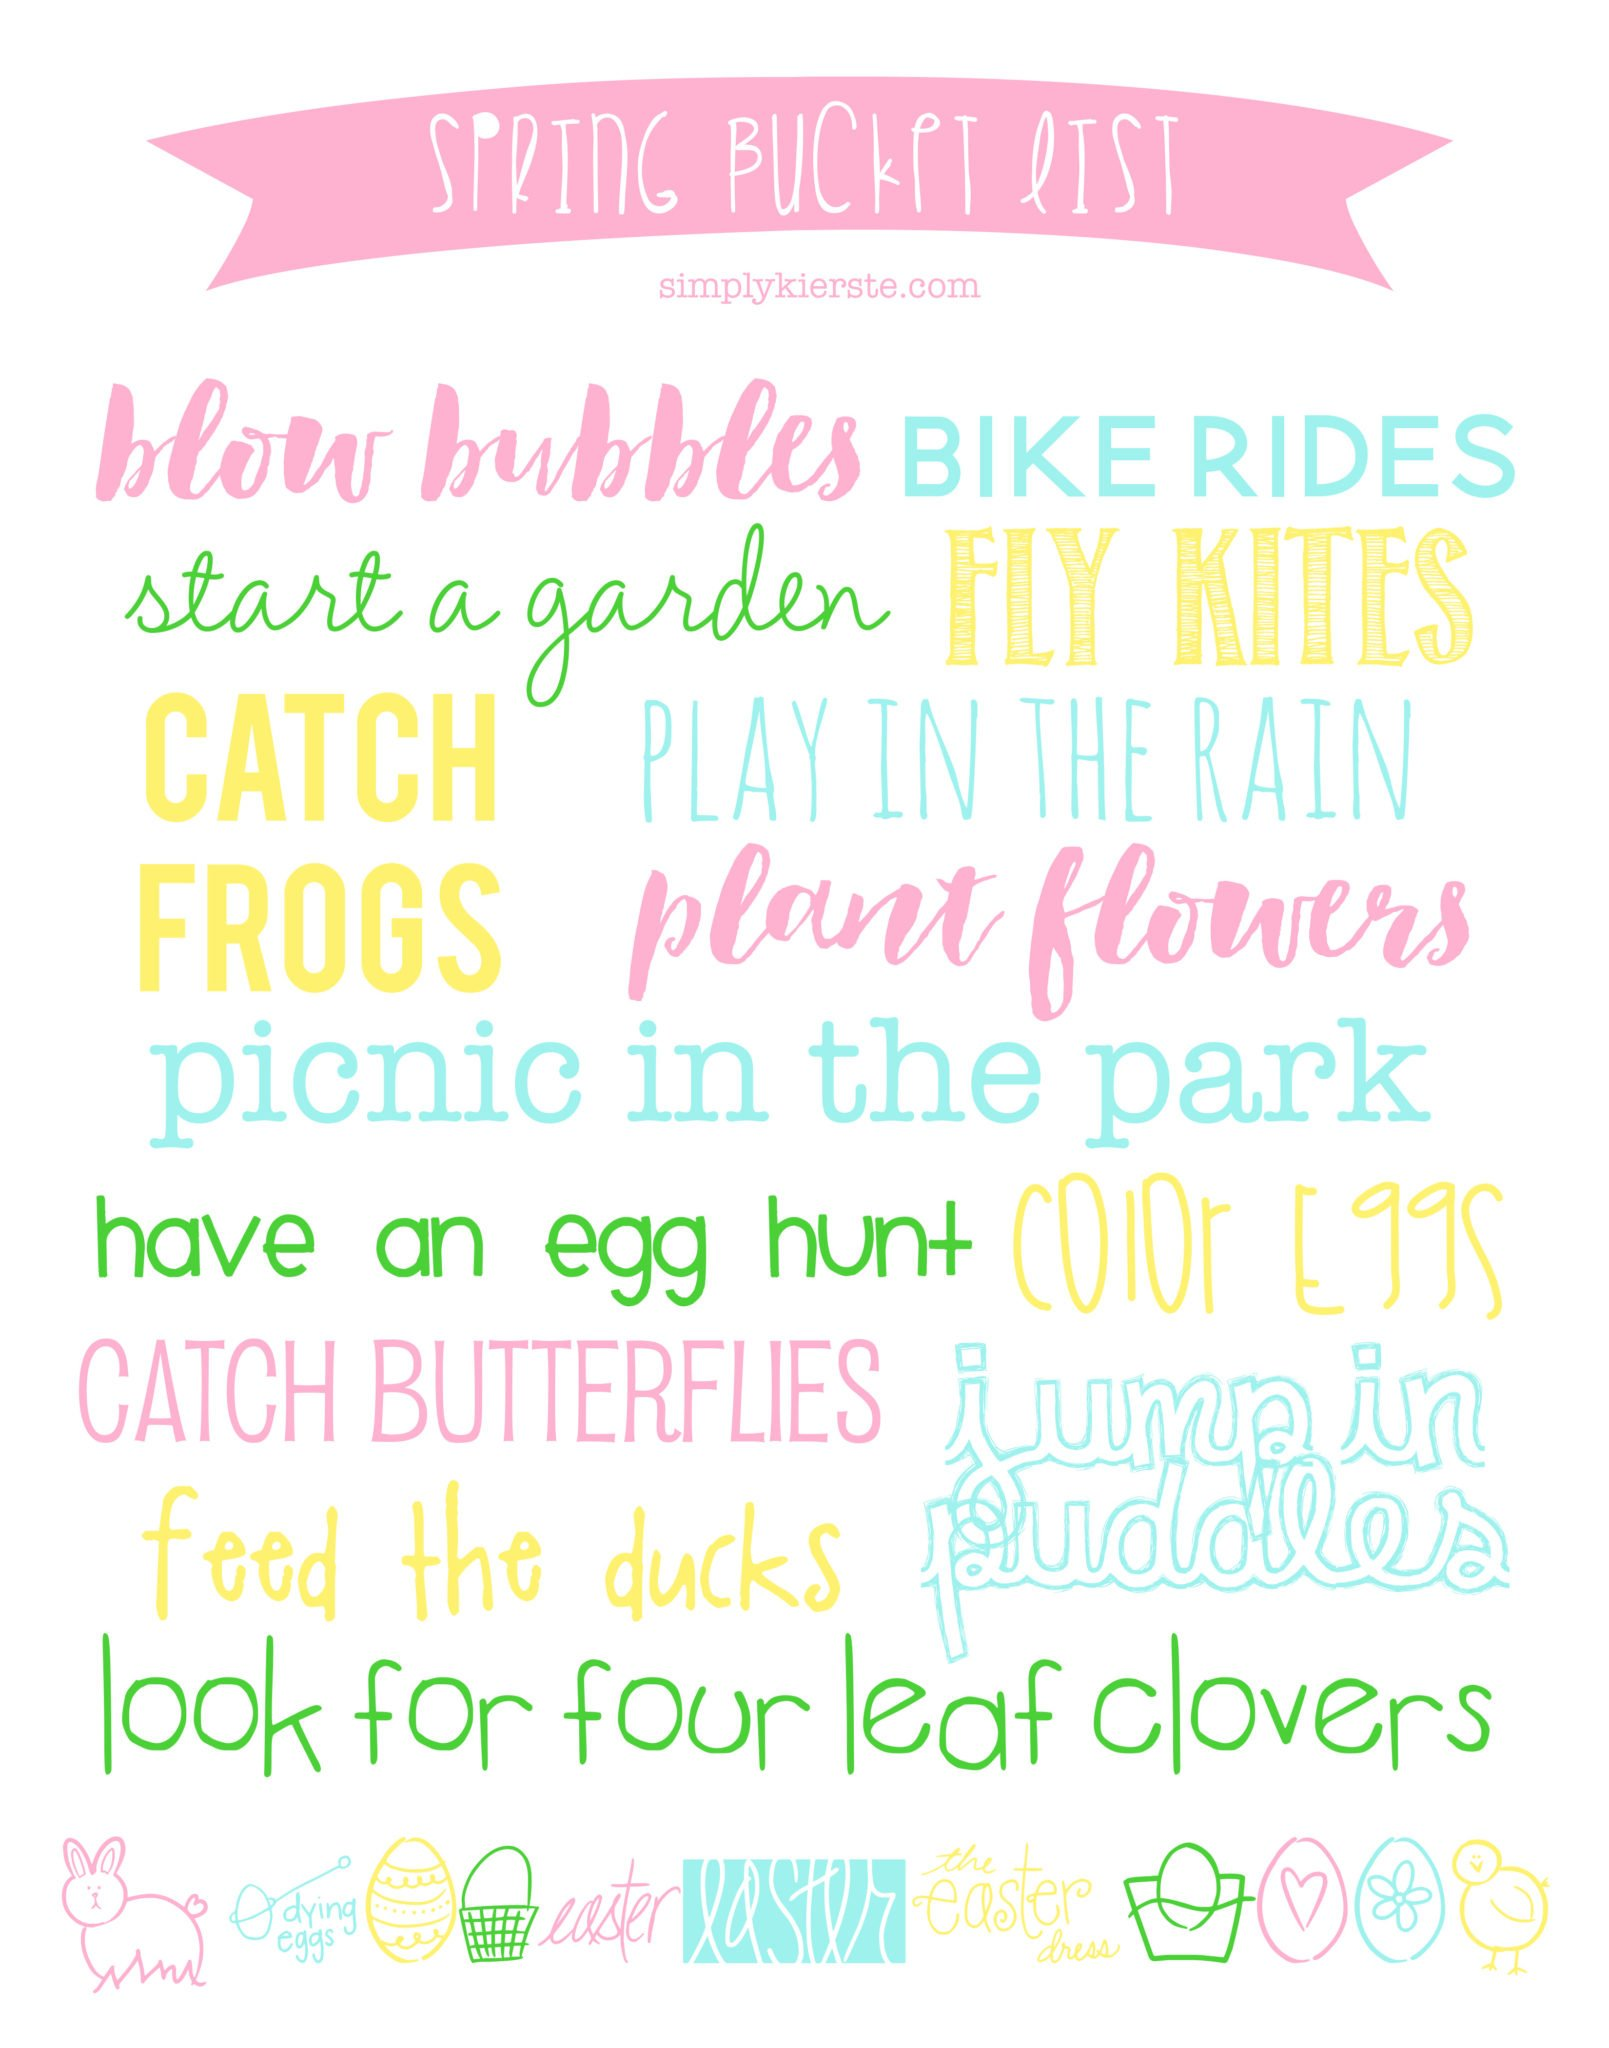 Spring Bucket List Simply Kierste Design Co